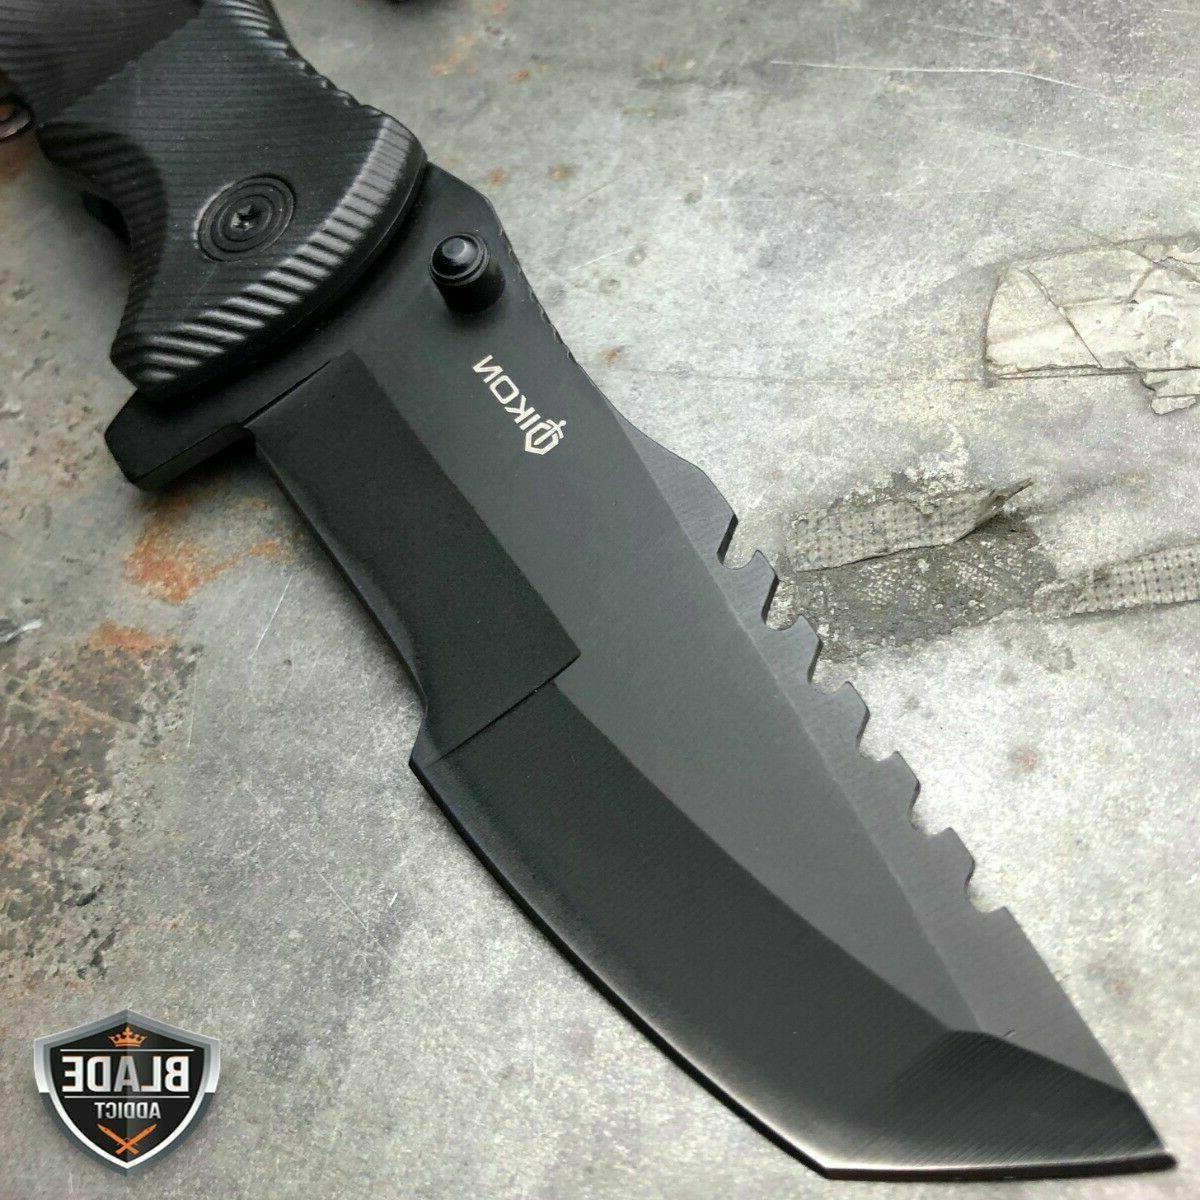 TACTICAL Pocket Knife RAZOR FOLDING